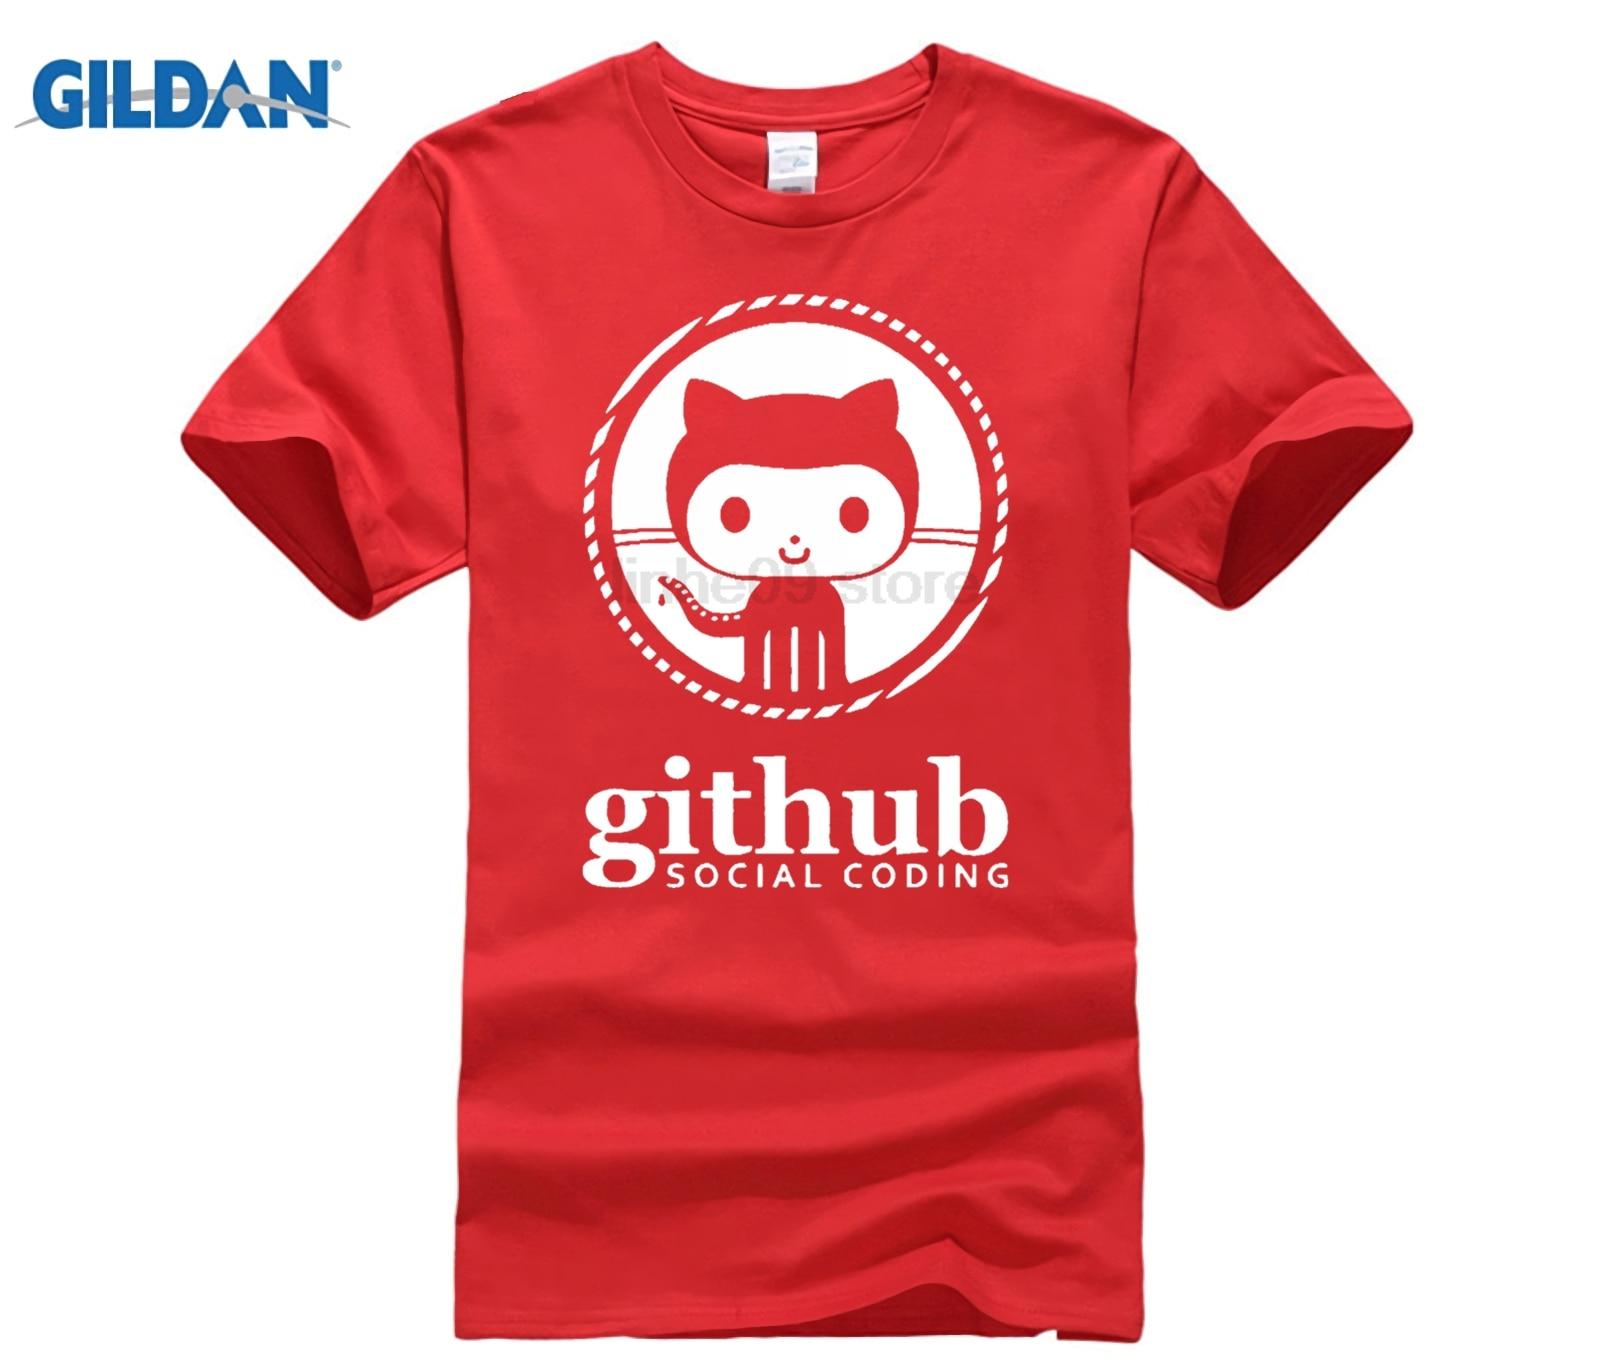 GEEK Linux Programmer Github Social Coding Geek Mens Fashion T shirts O-neck 100% Cotton 220gms Boys Solid T-shirt Black colored